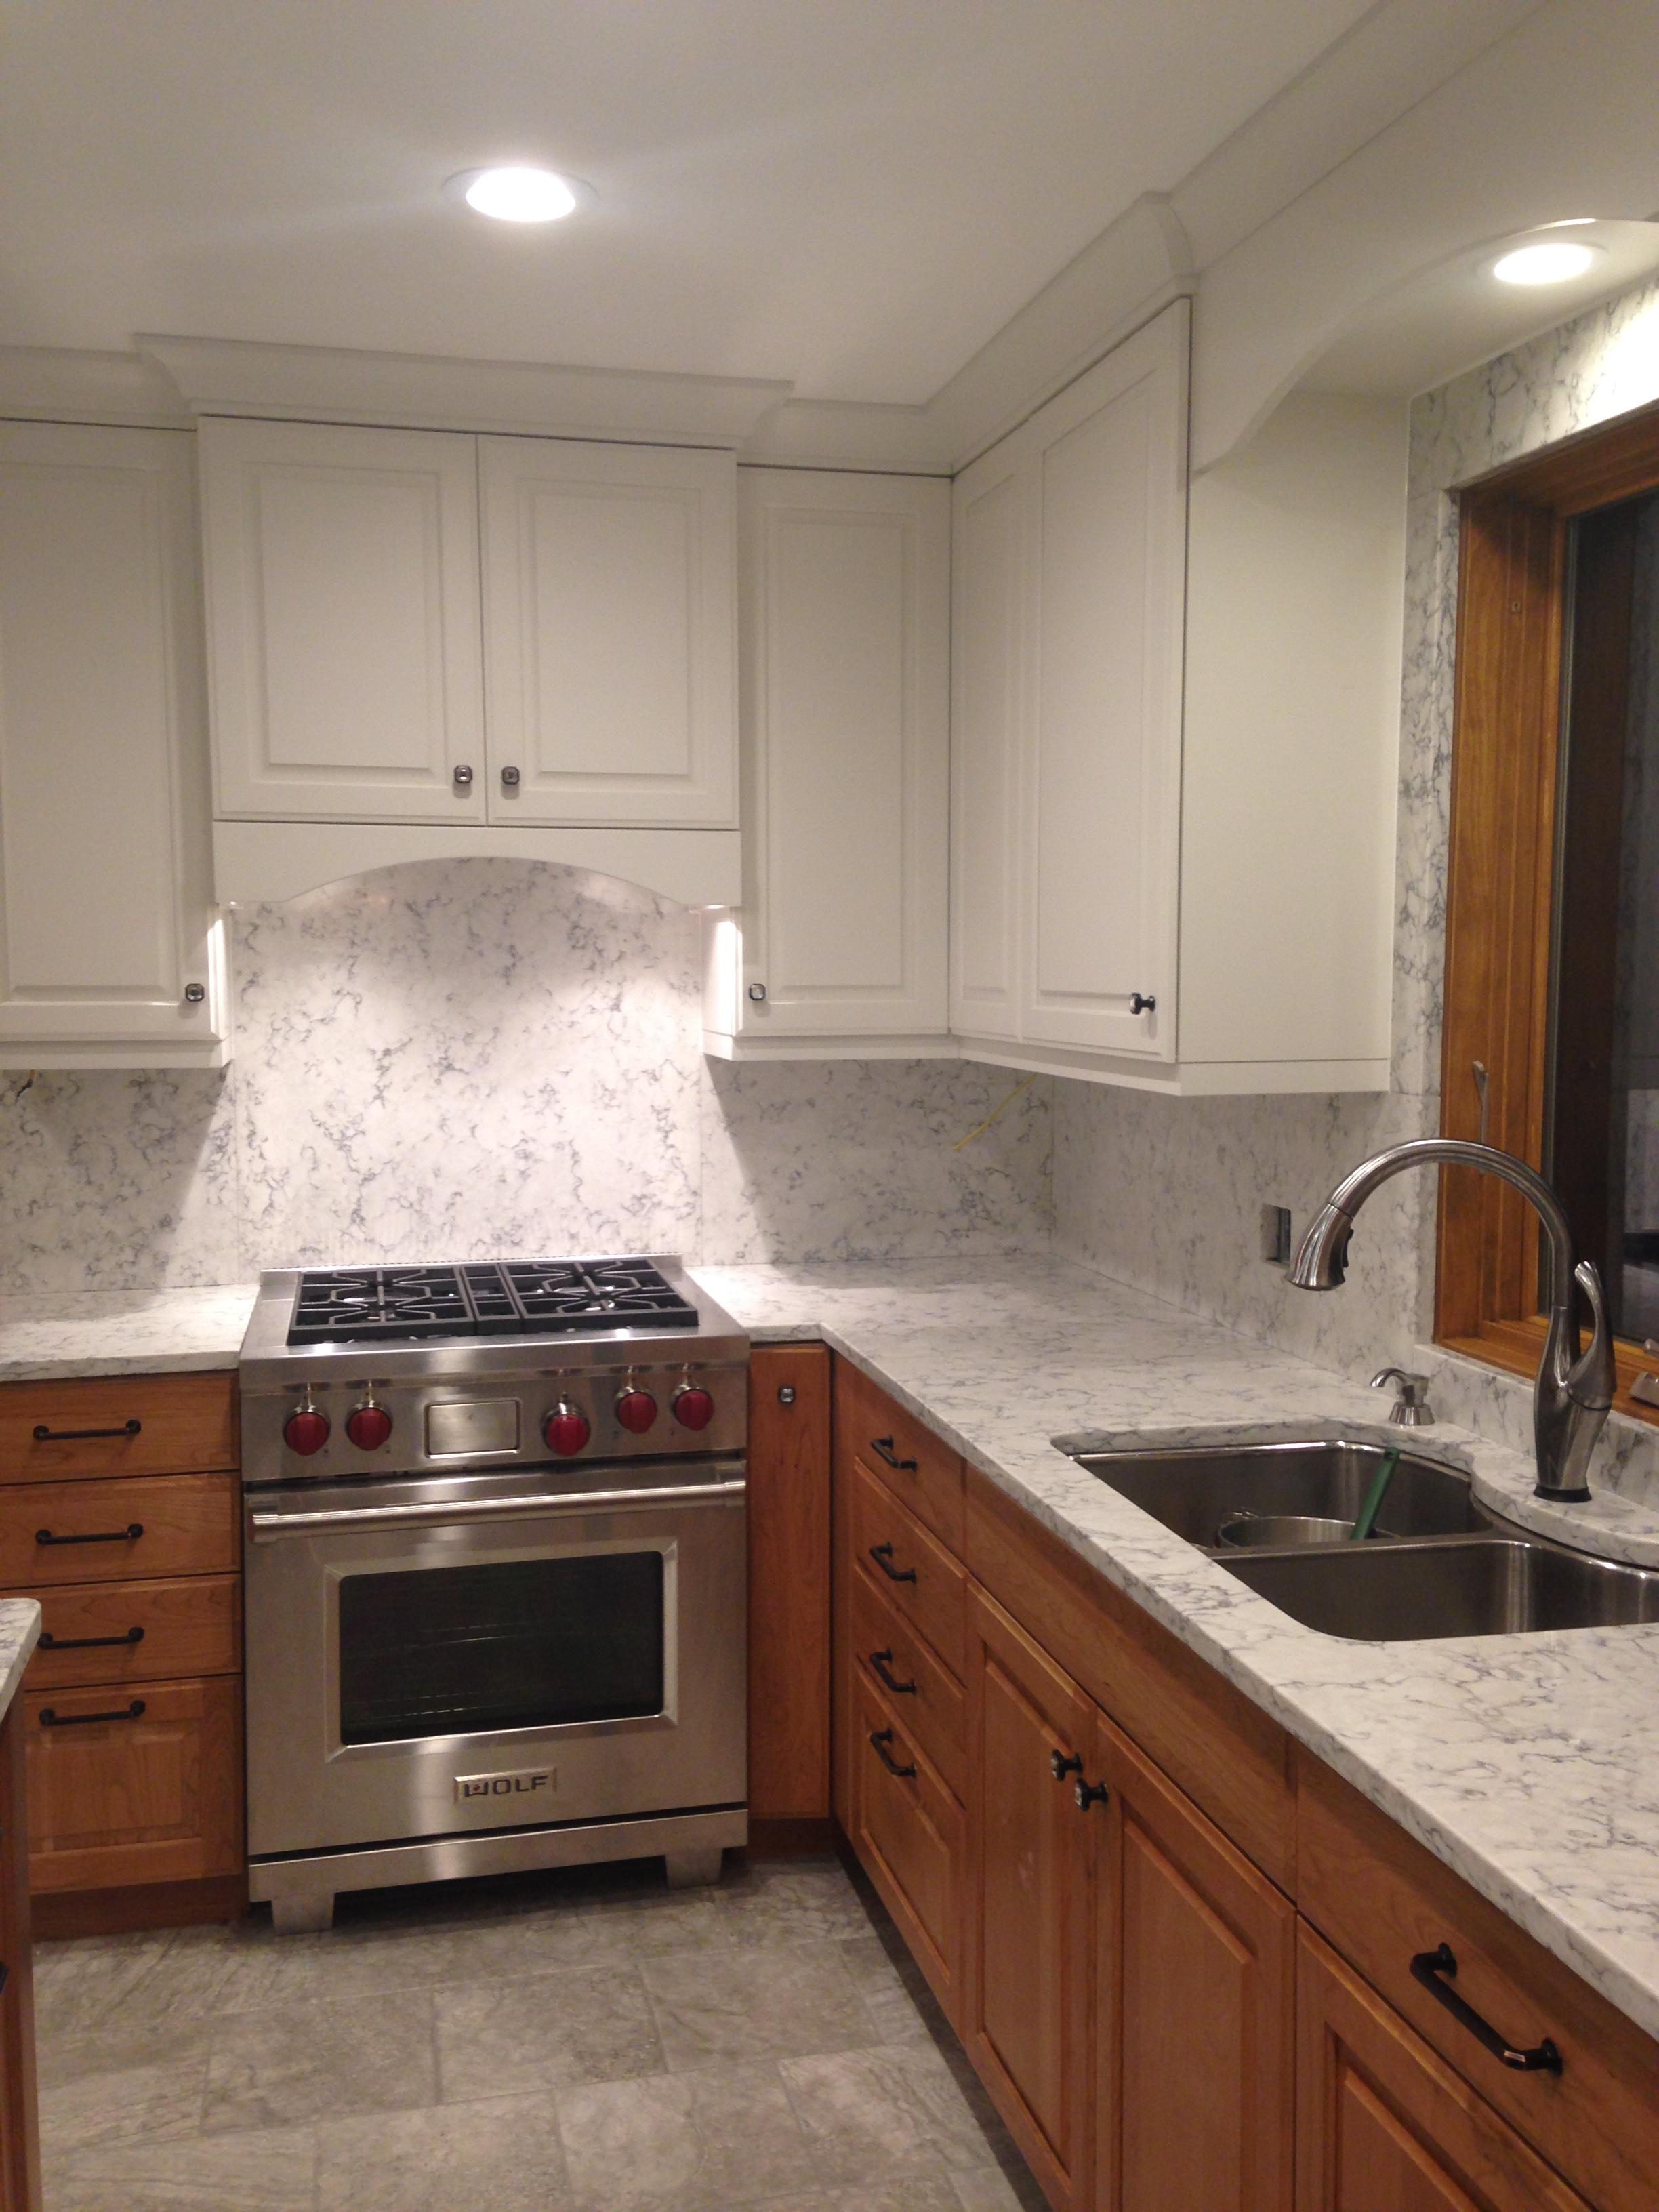 kitchen sink pendant light under cabinet shelving my re-do! quartz backsplash | nina in the